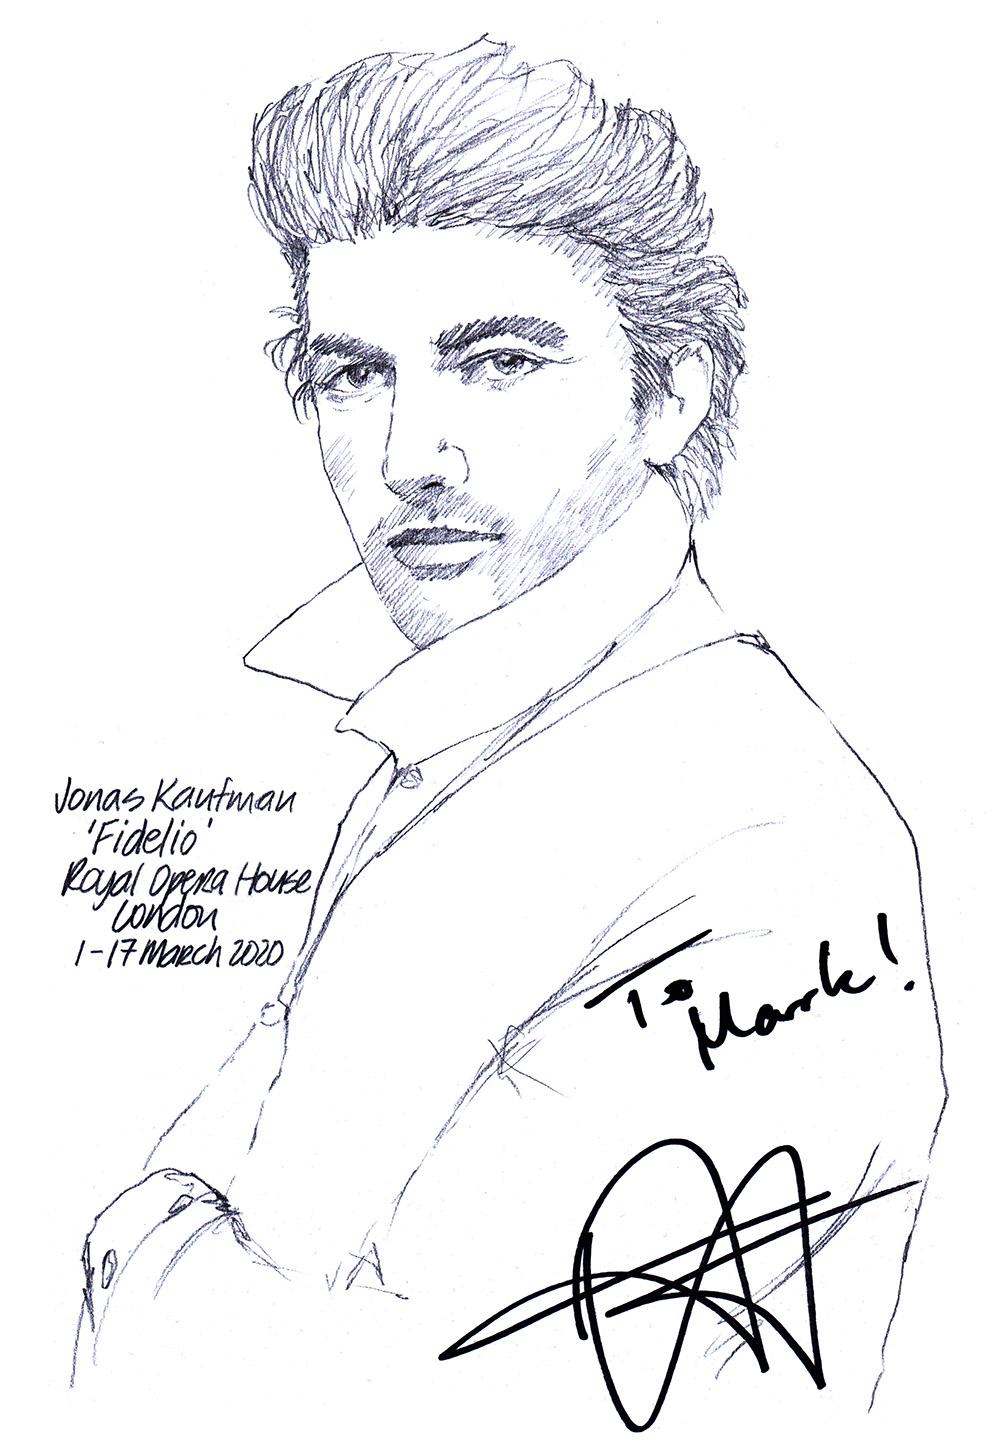 Autographed drawing of tenor Jonas Kaufman